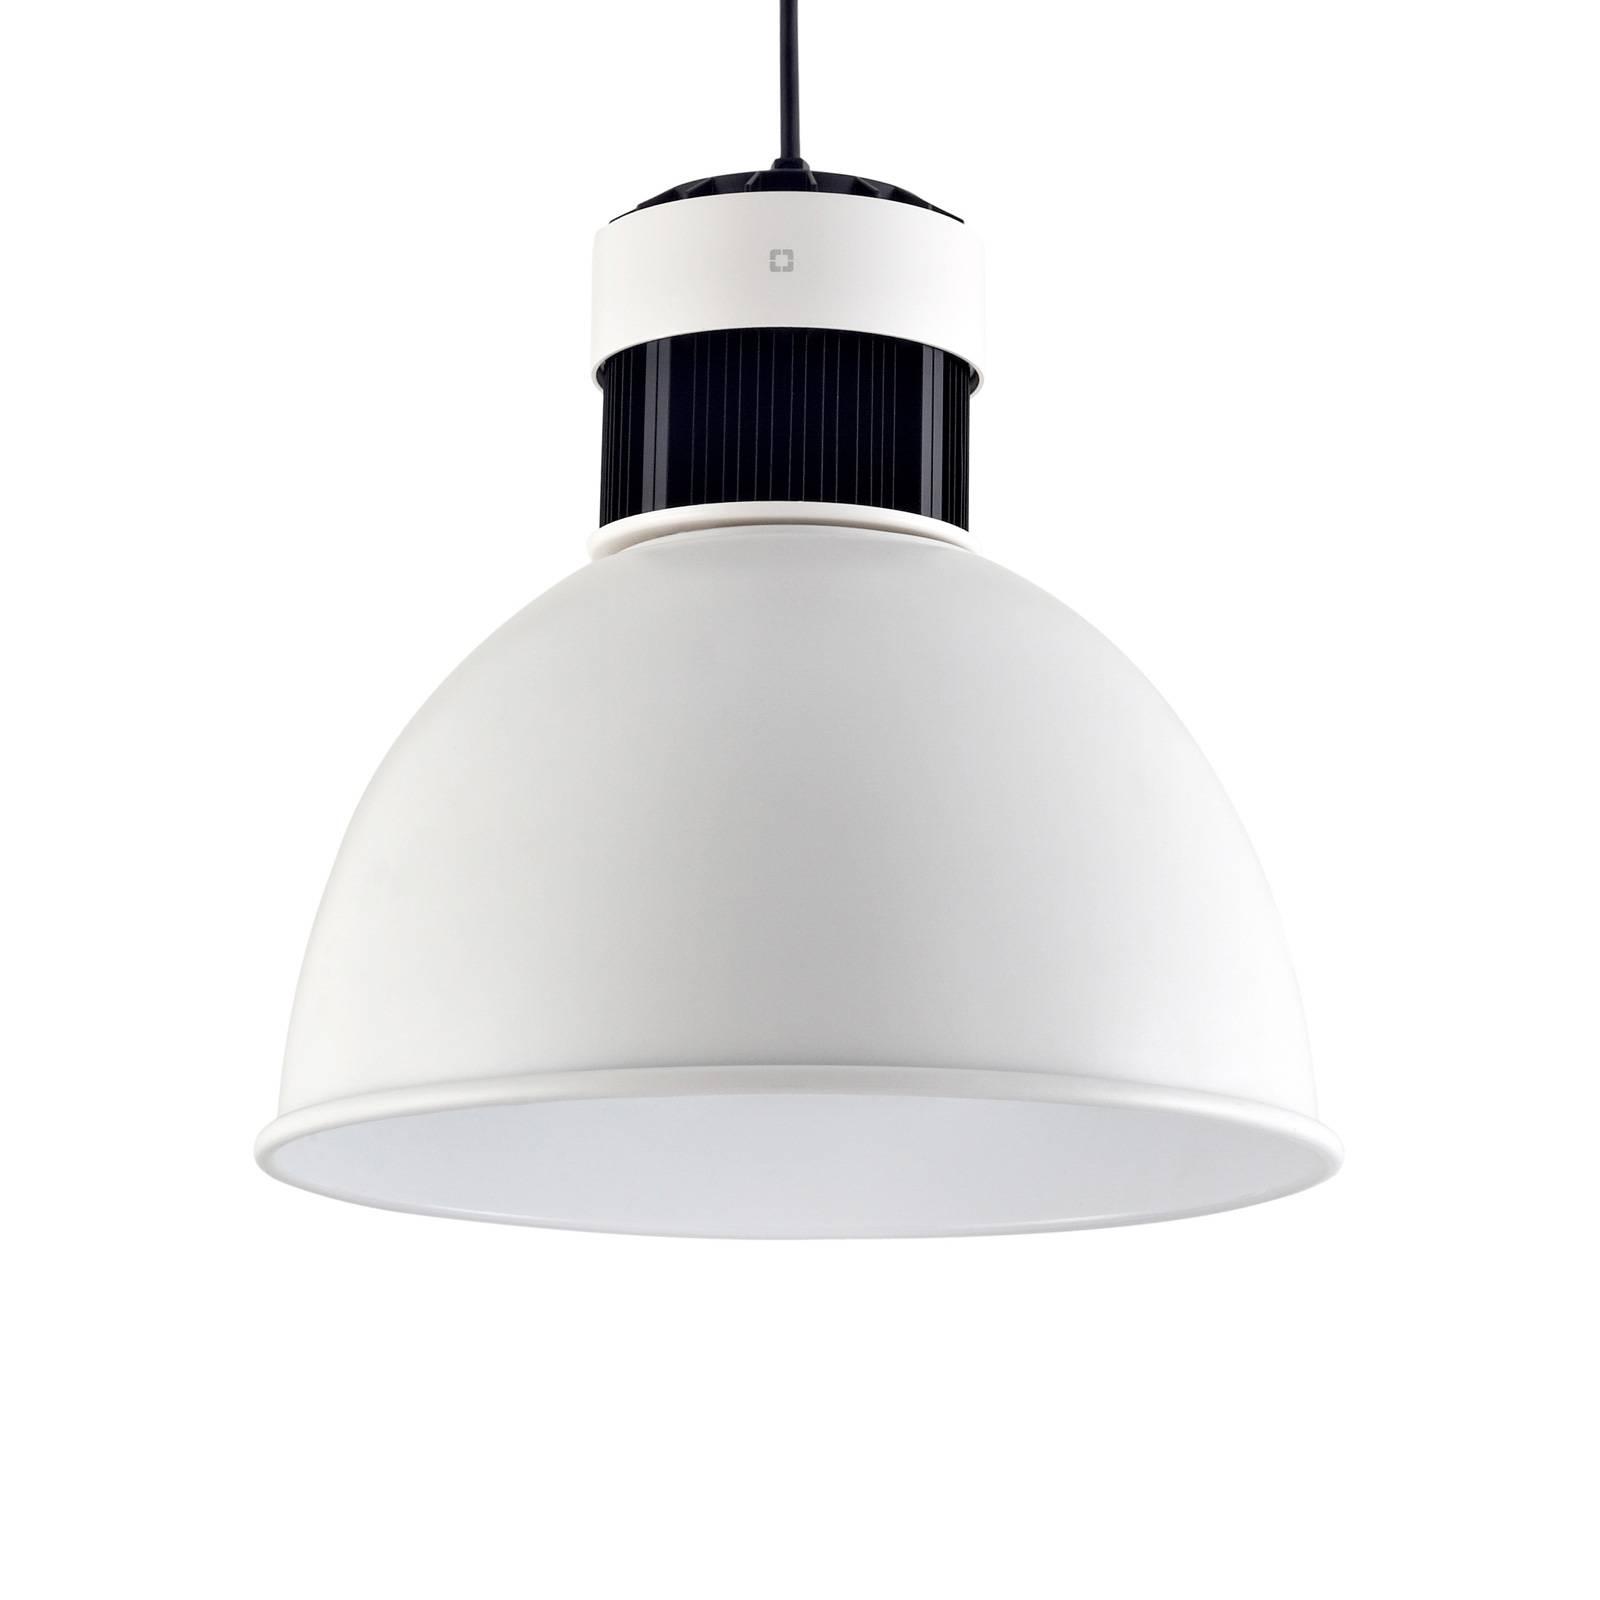 LEDS-C4 Pek -LED-riippuvalaisin